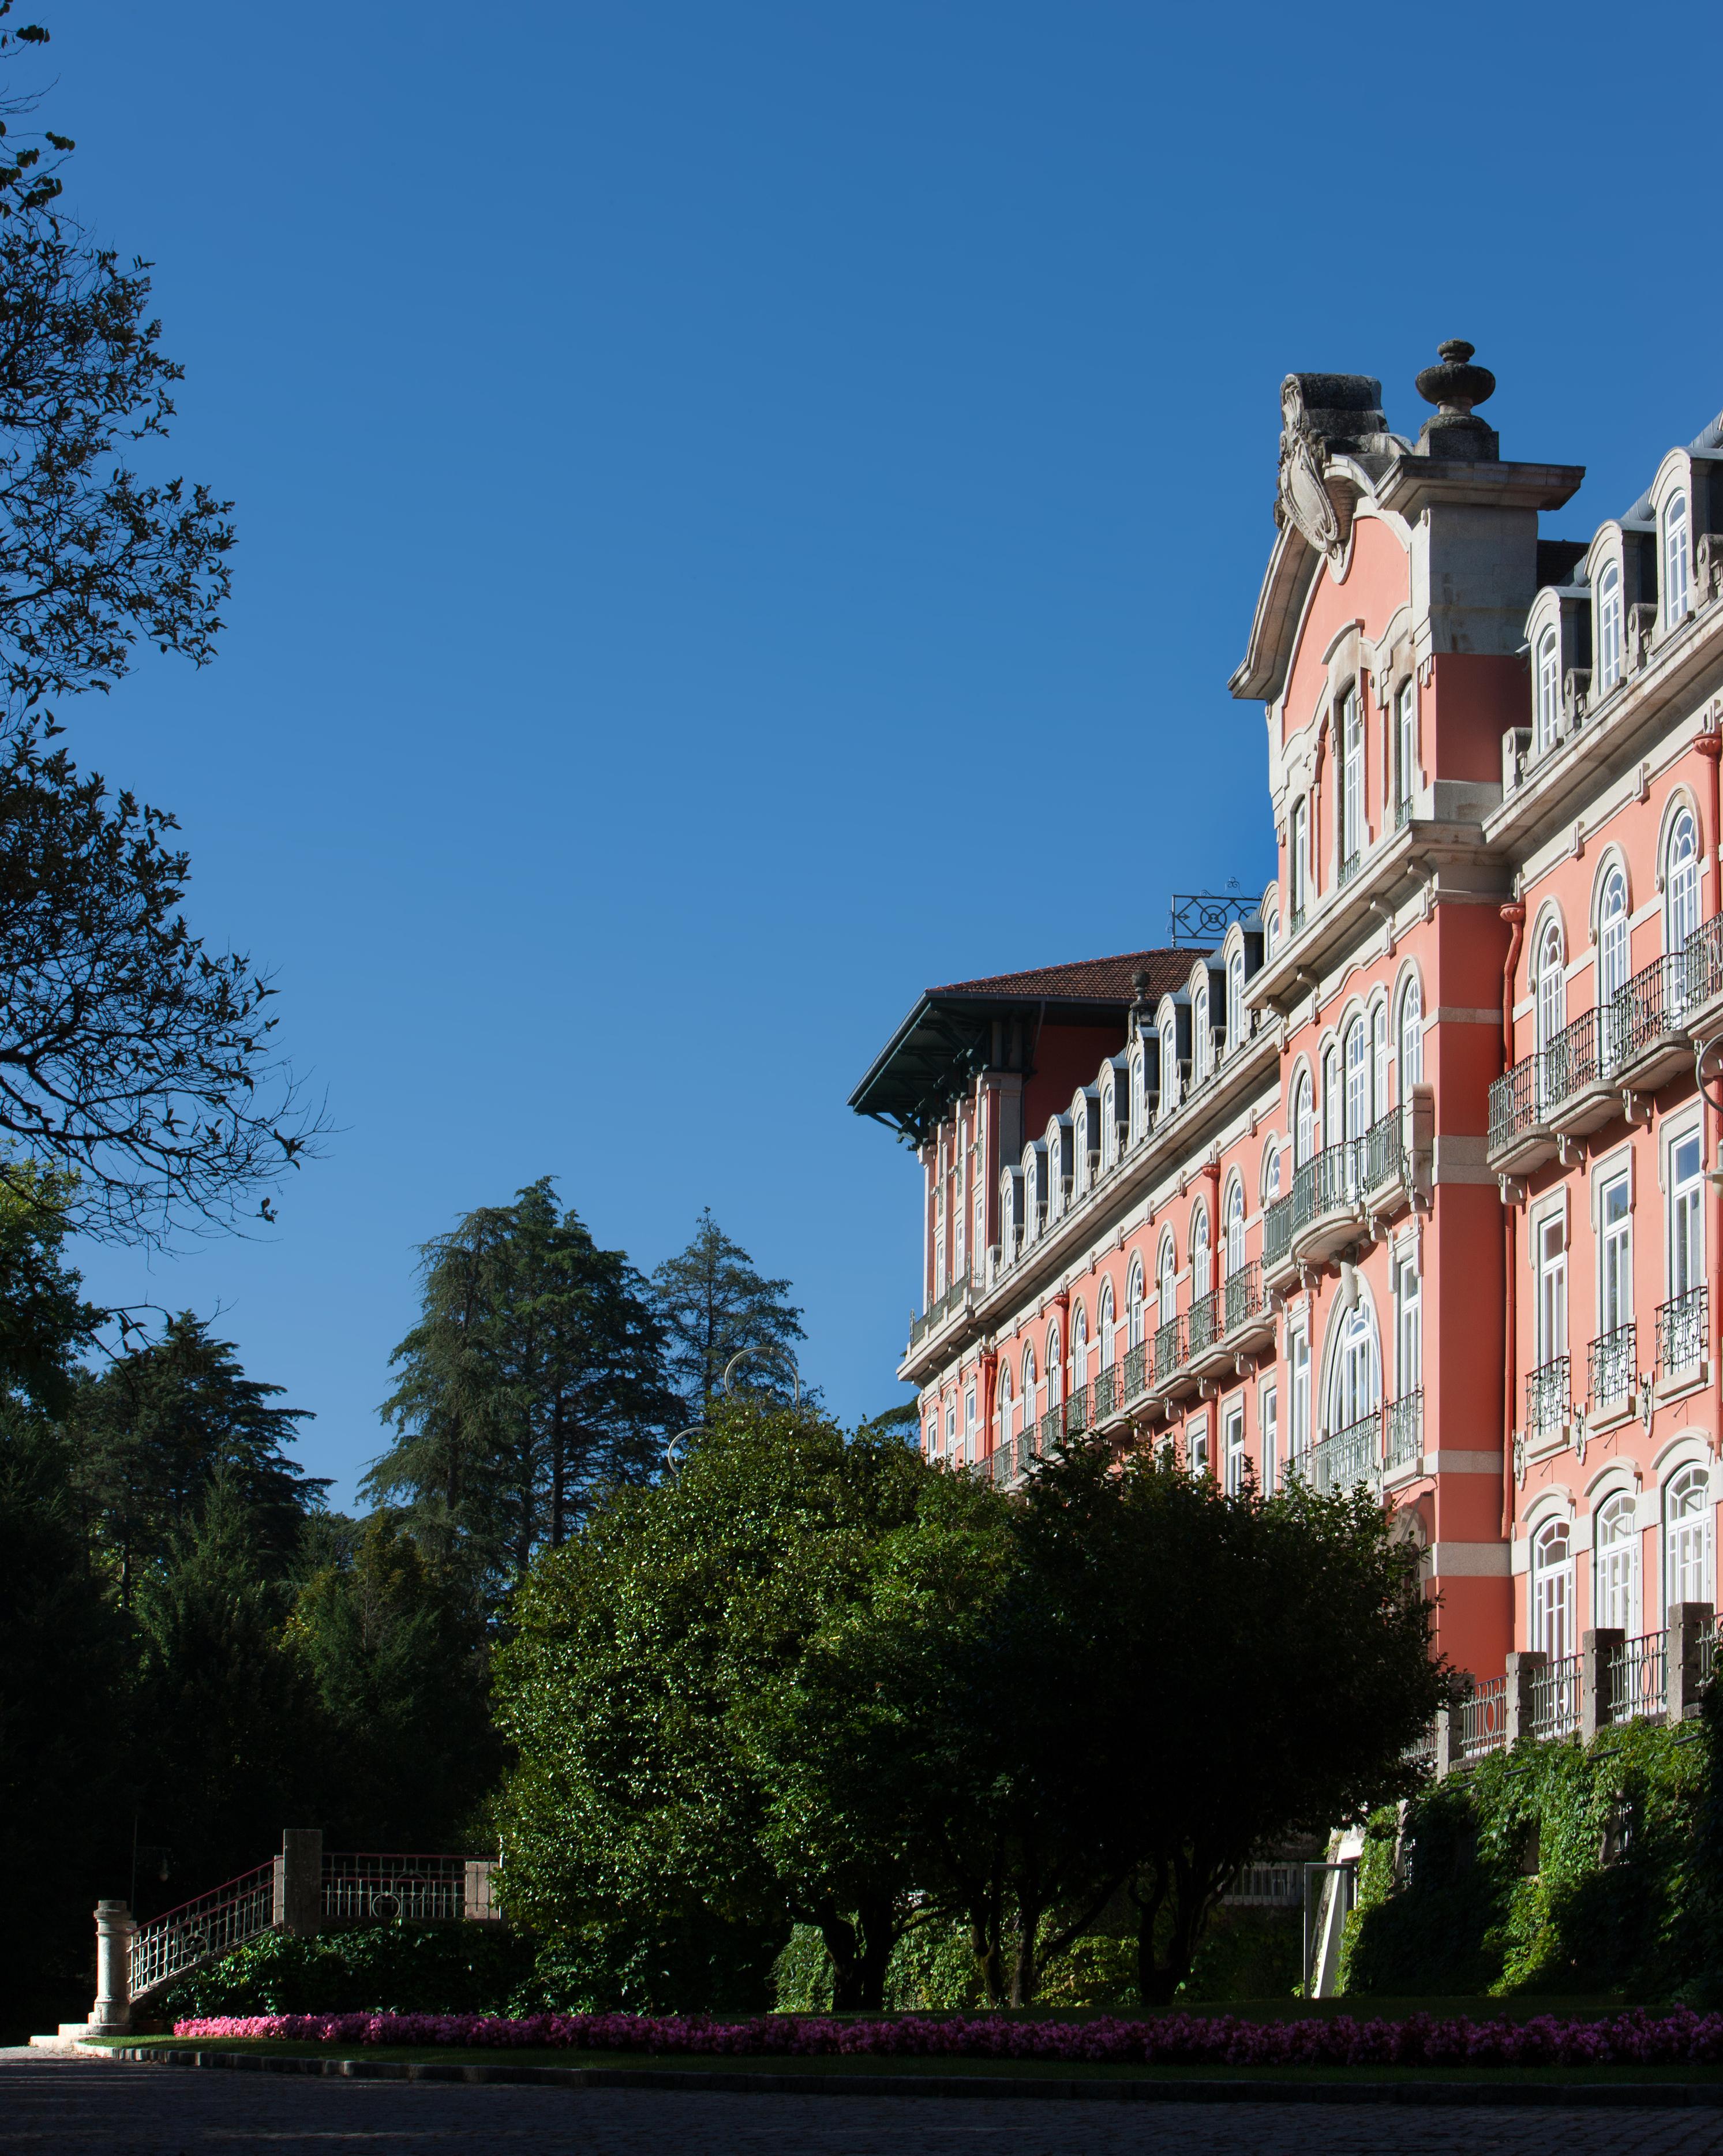 honeymoon-destinations-2015-portugal-vidago-palace-0115.jpg